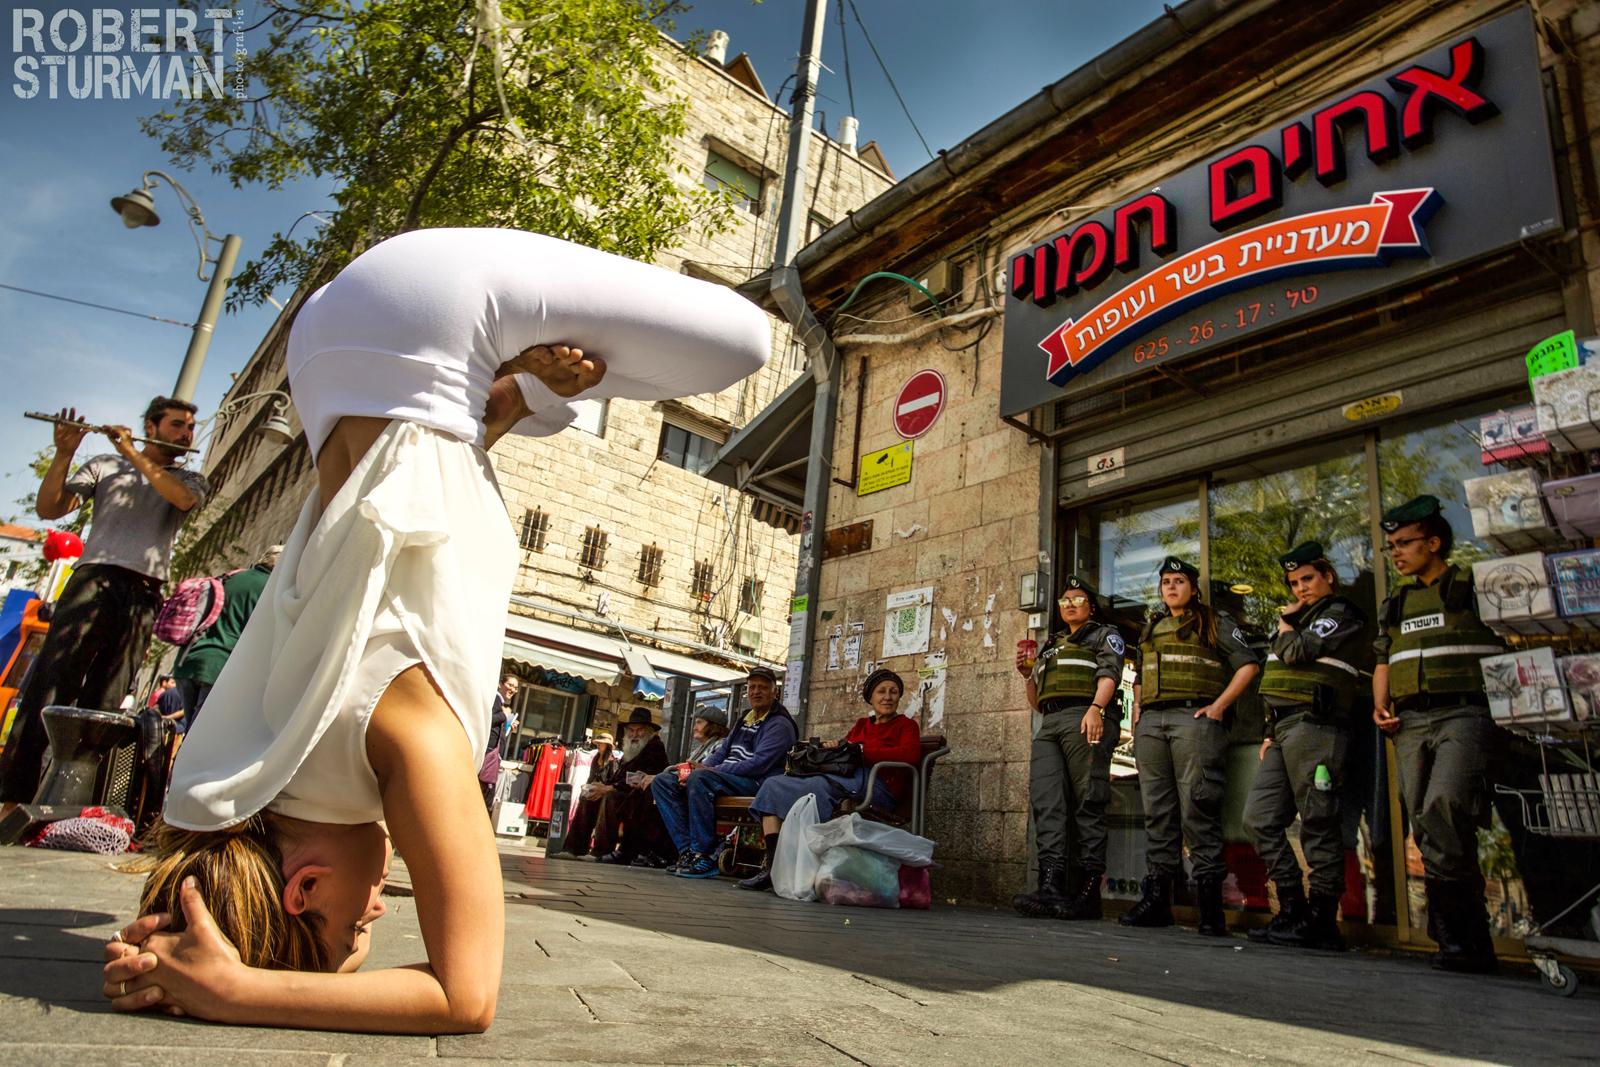 Talia Sutra in Jerusalem's Machane Yehuda market. Photo by Robert Sturman